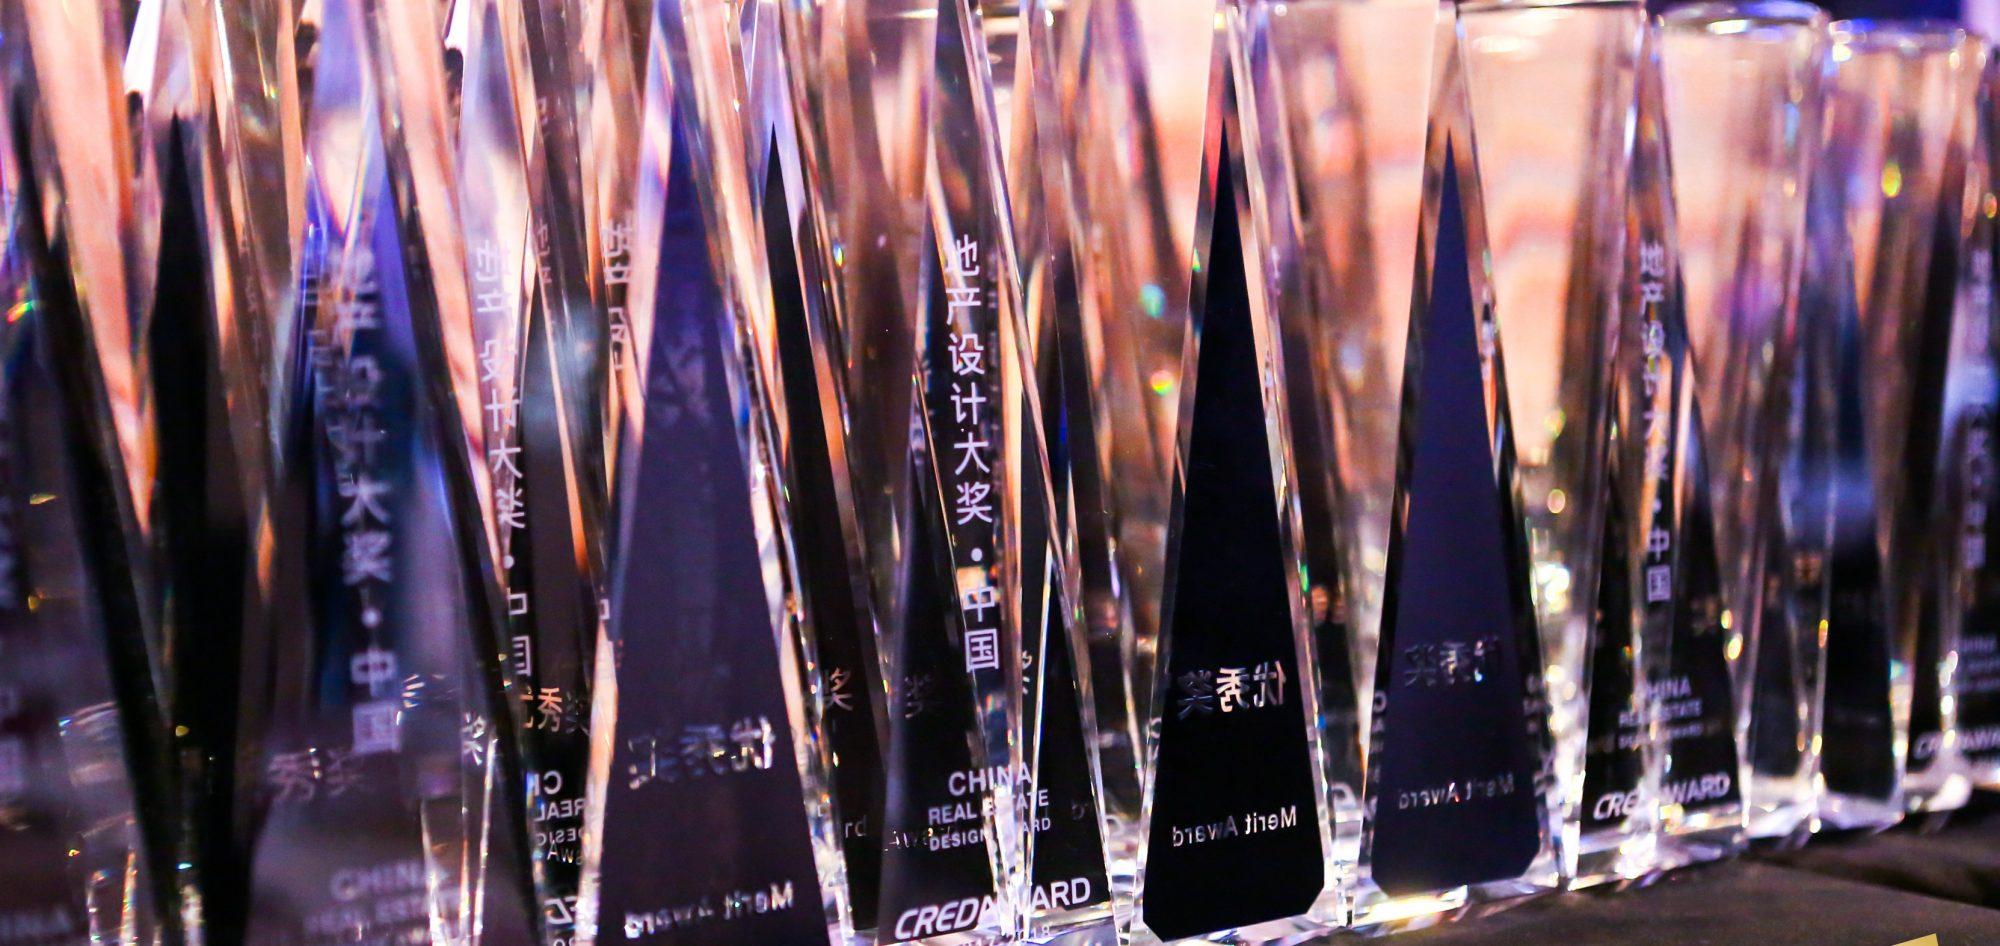 2017-18 China Real Estate Design Award